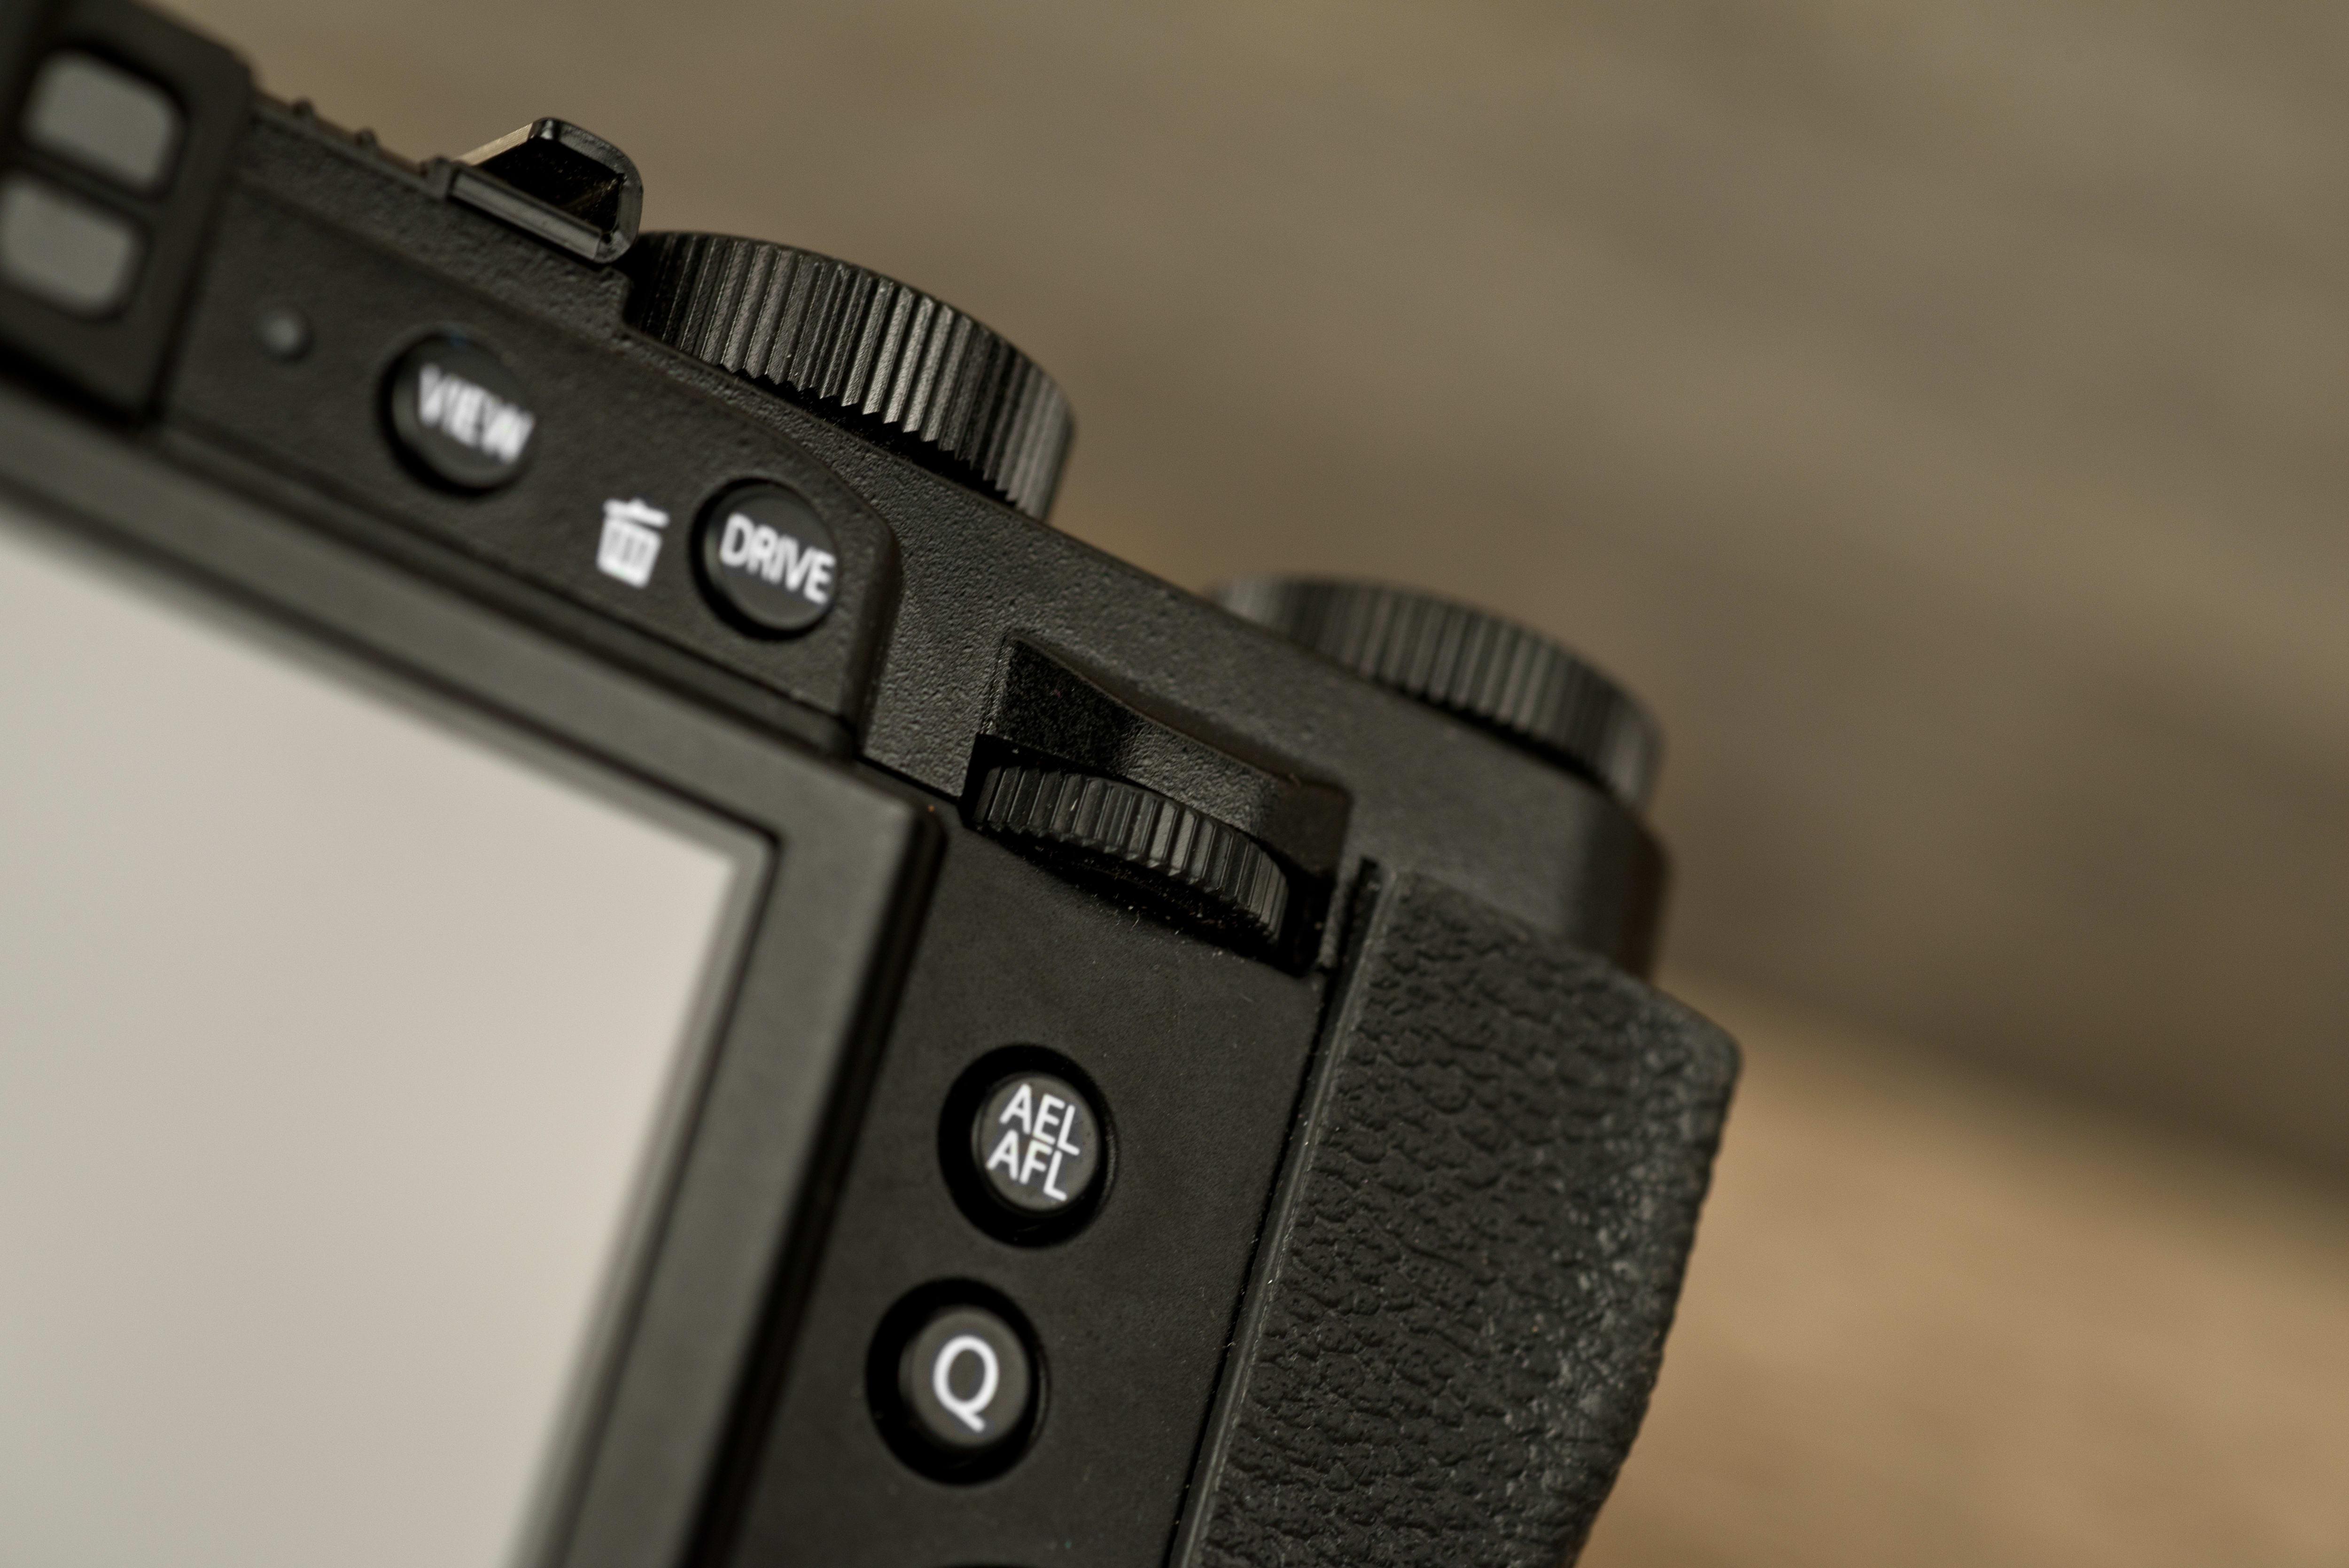 A photo of the Fujifilm X30's rear control dial.